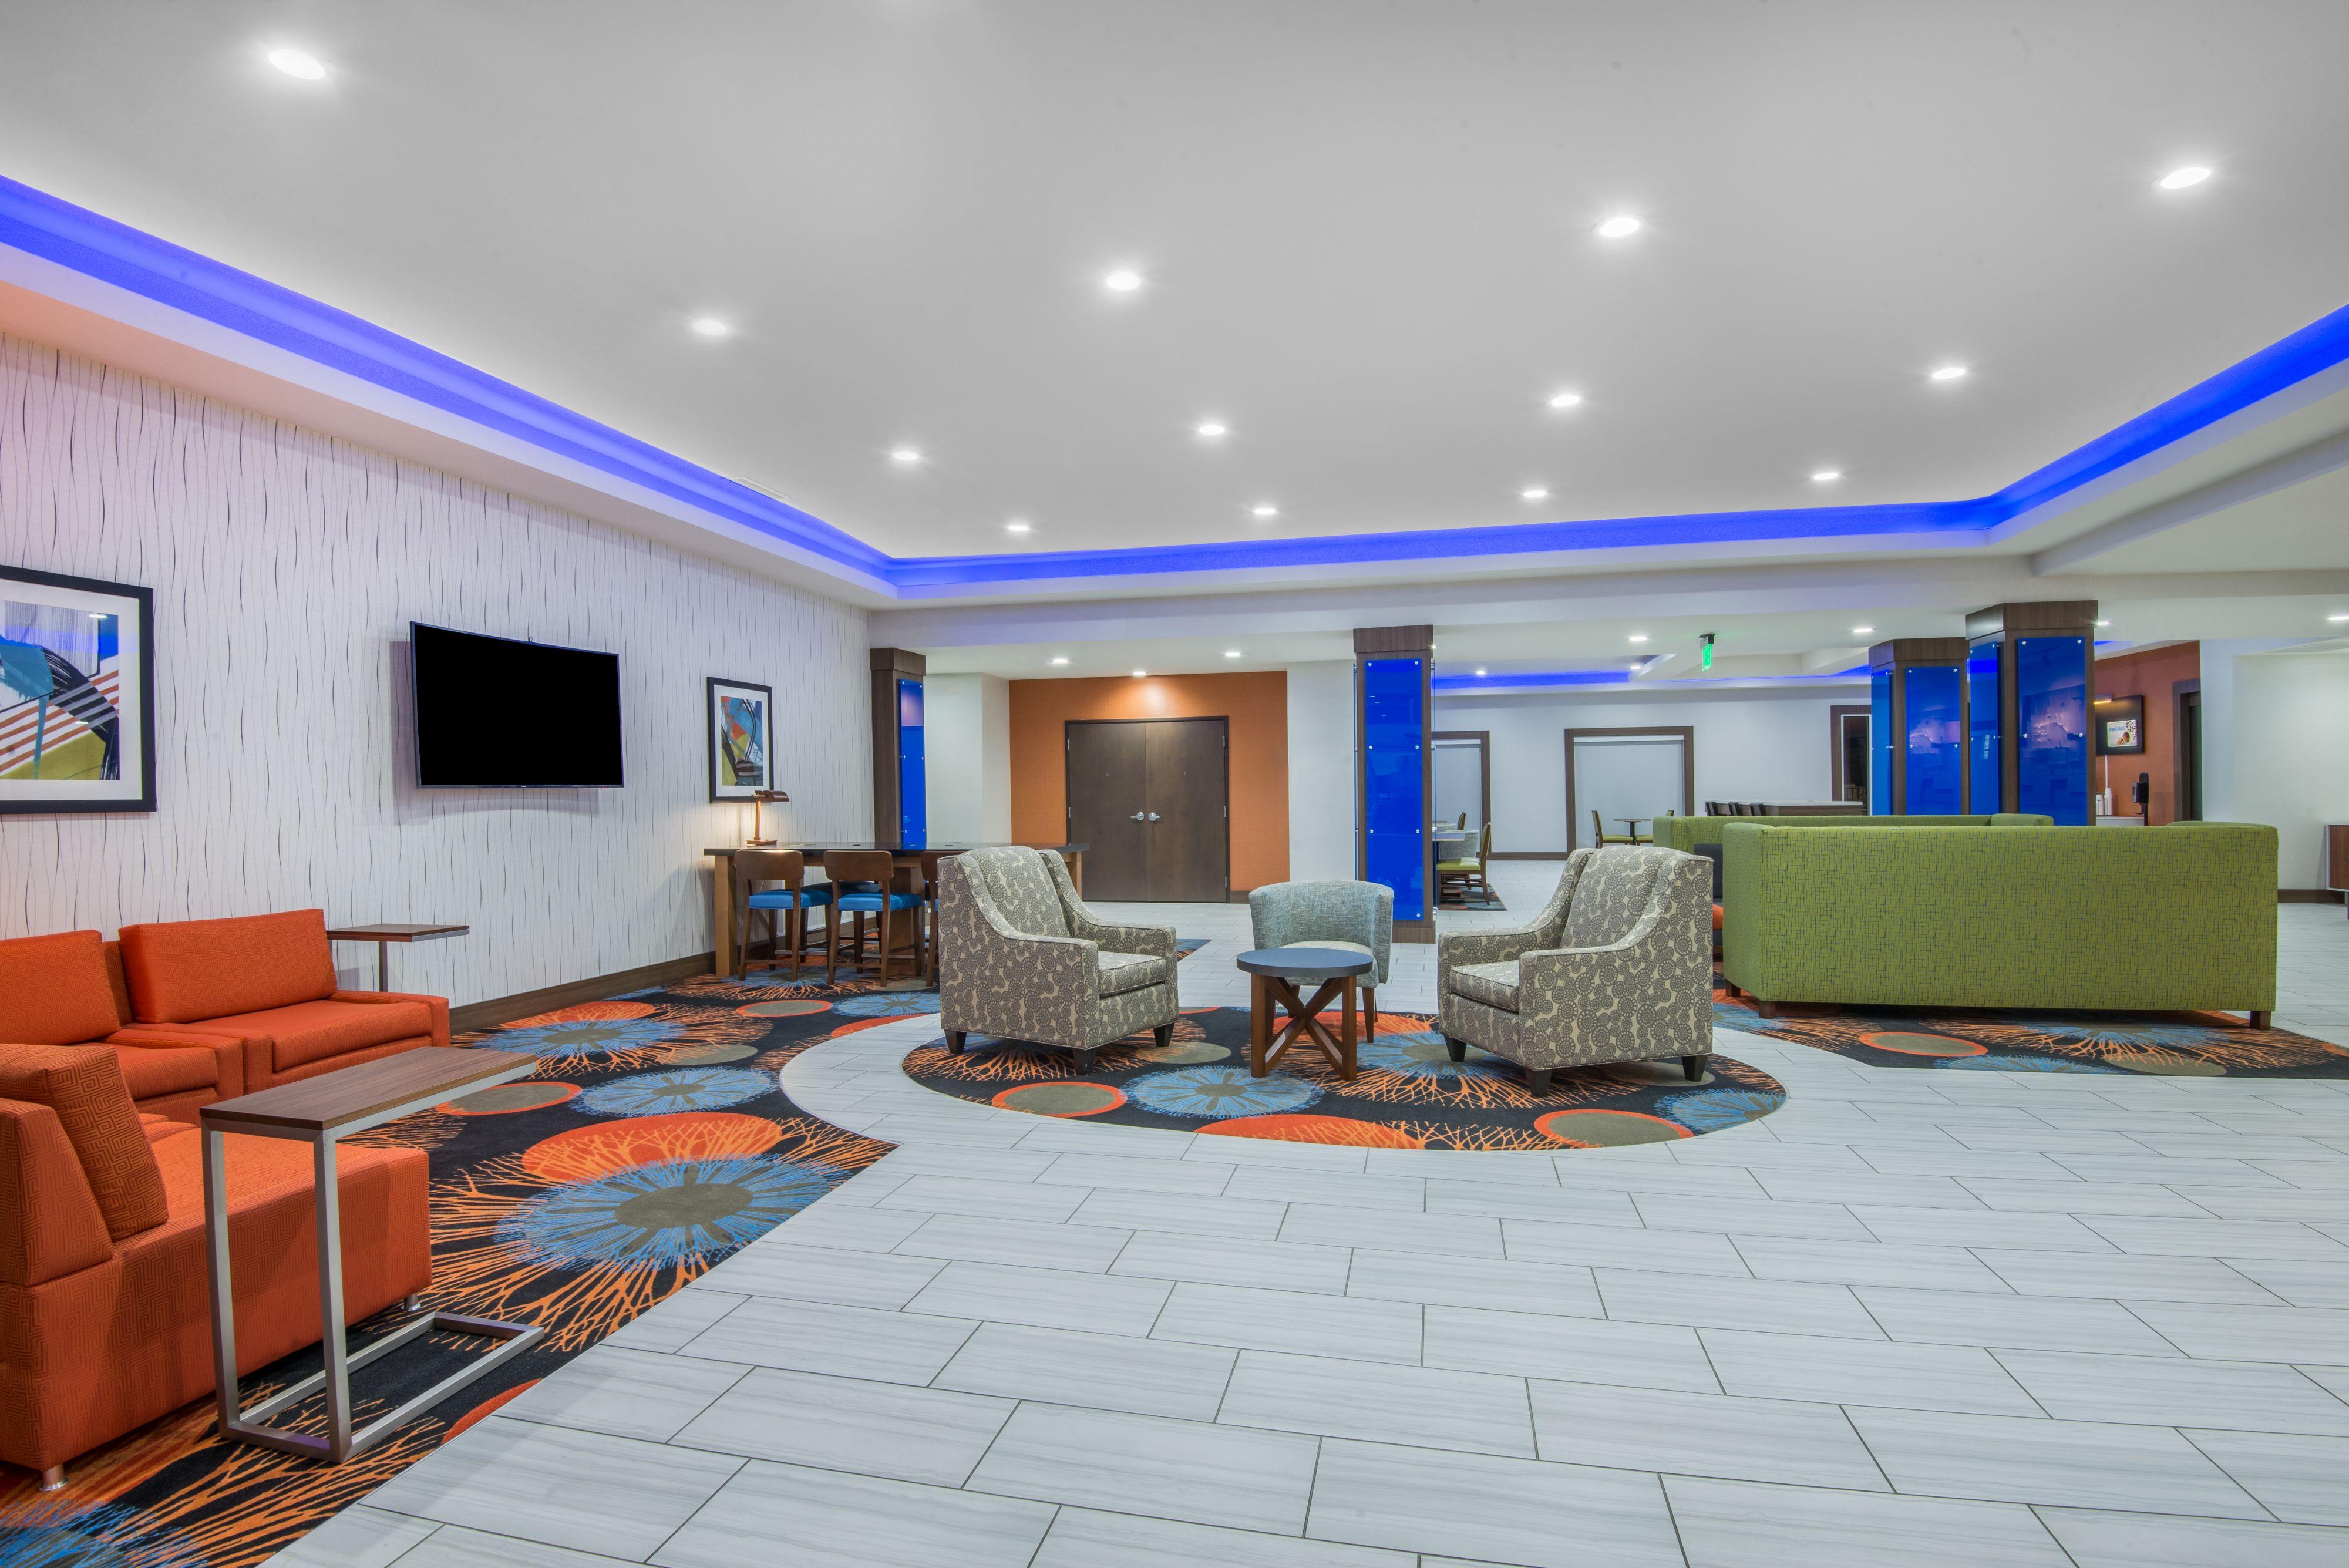 Holiday Inn Express & Suites Stillwater - University Area image 5